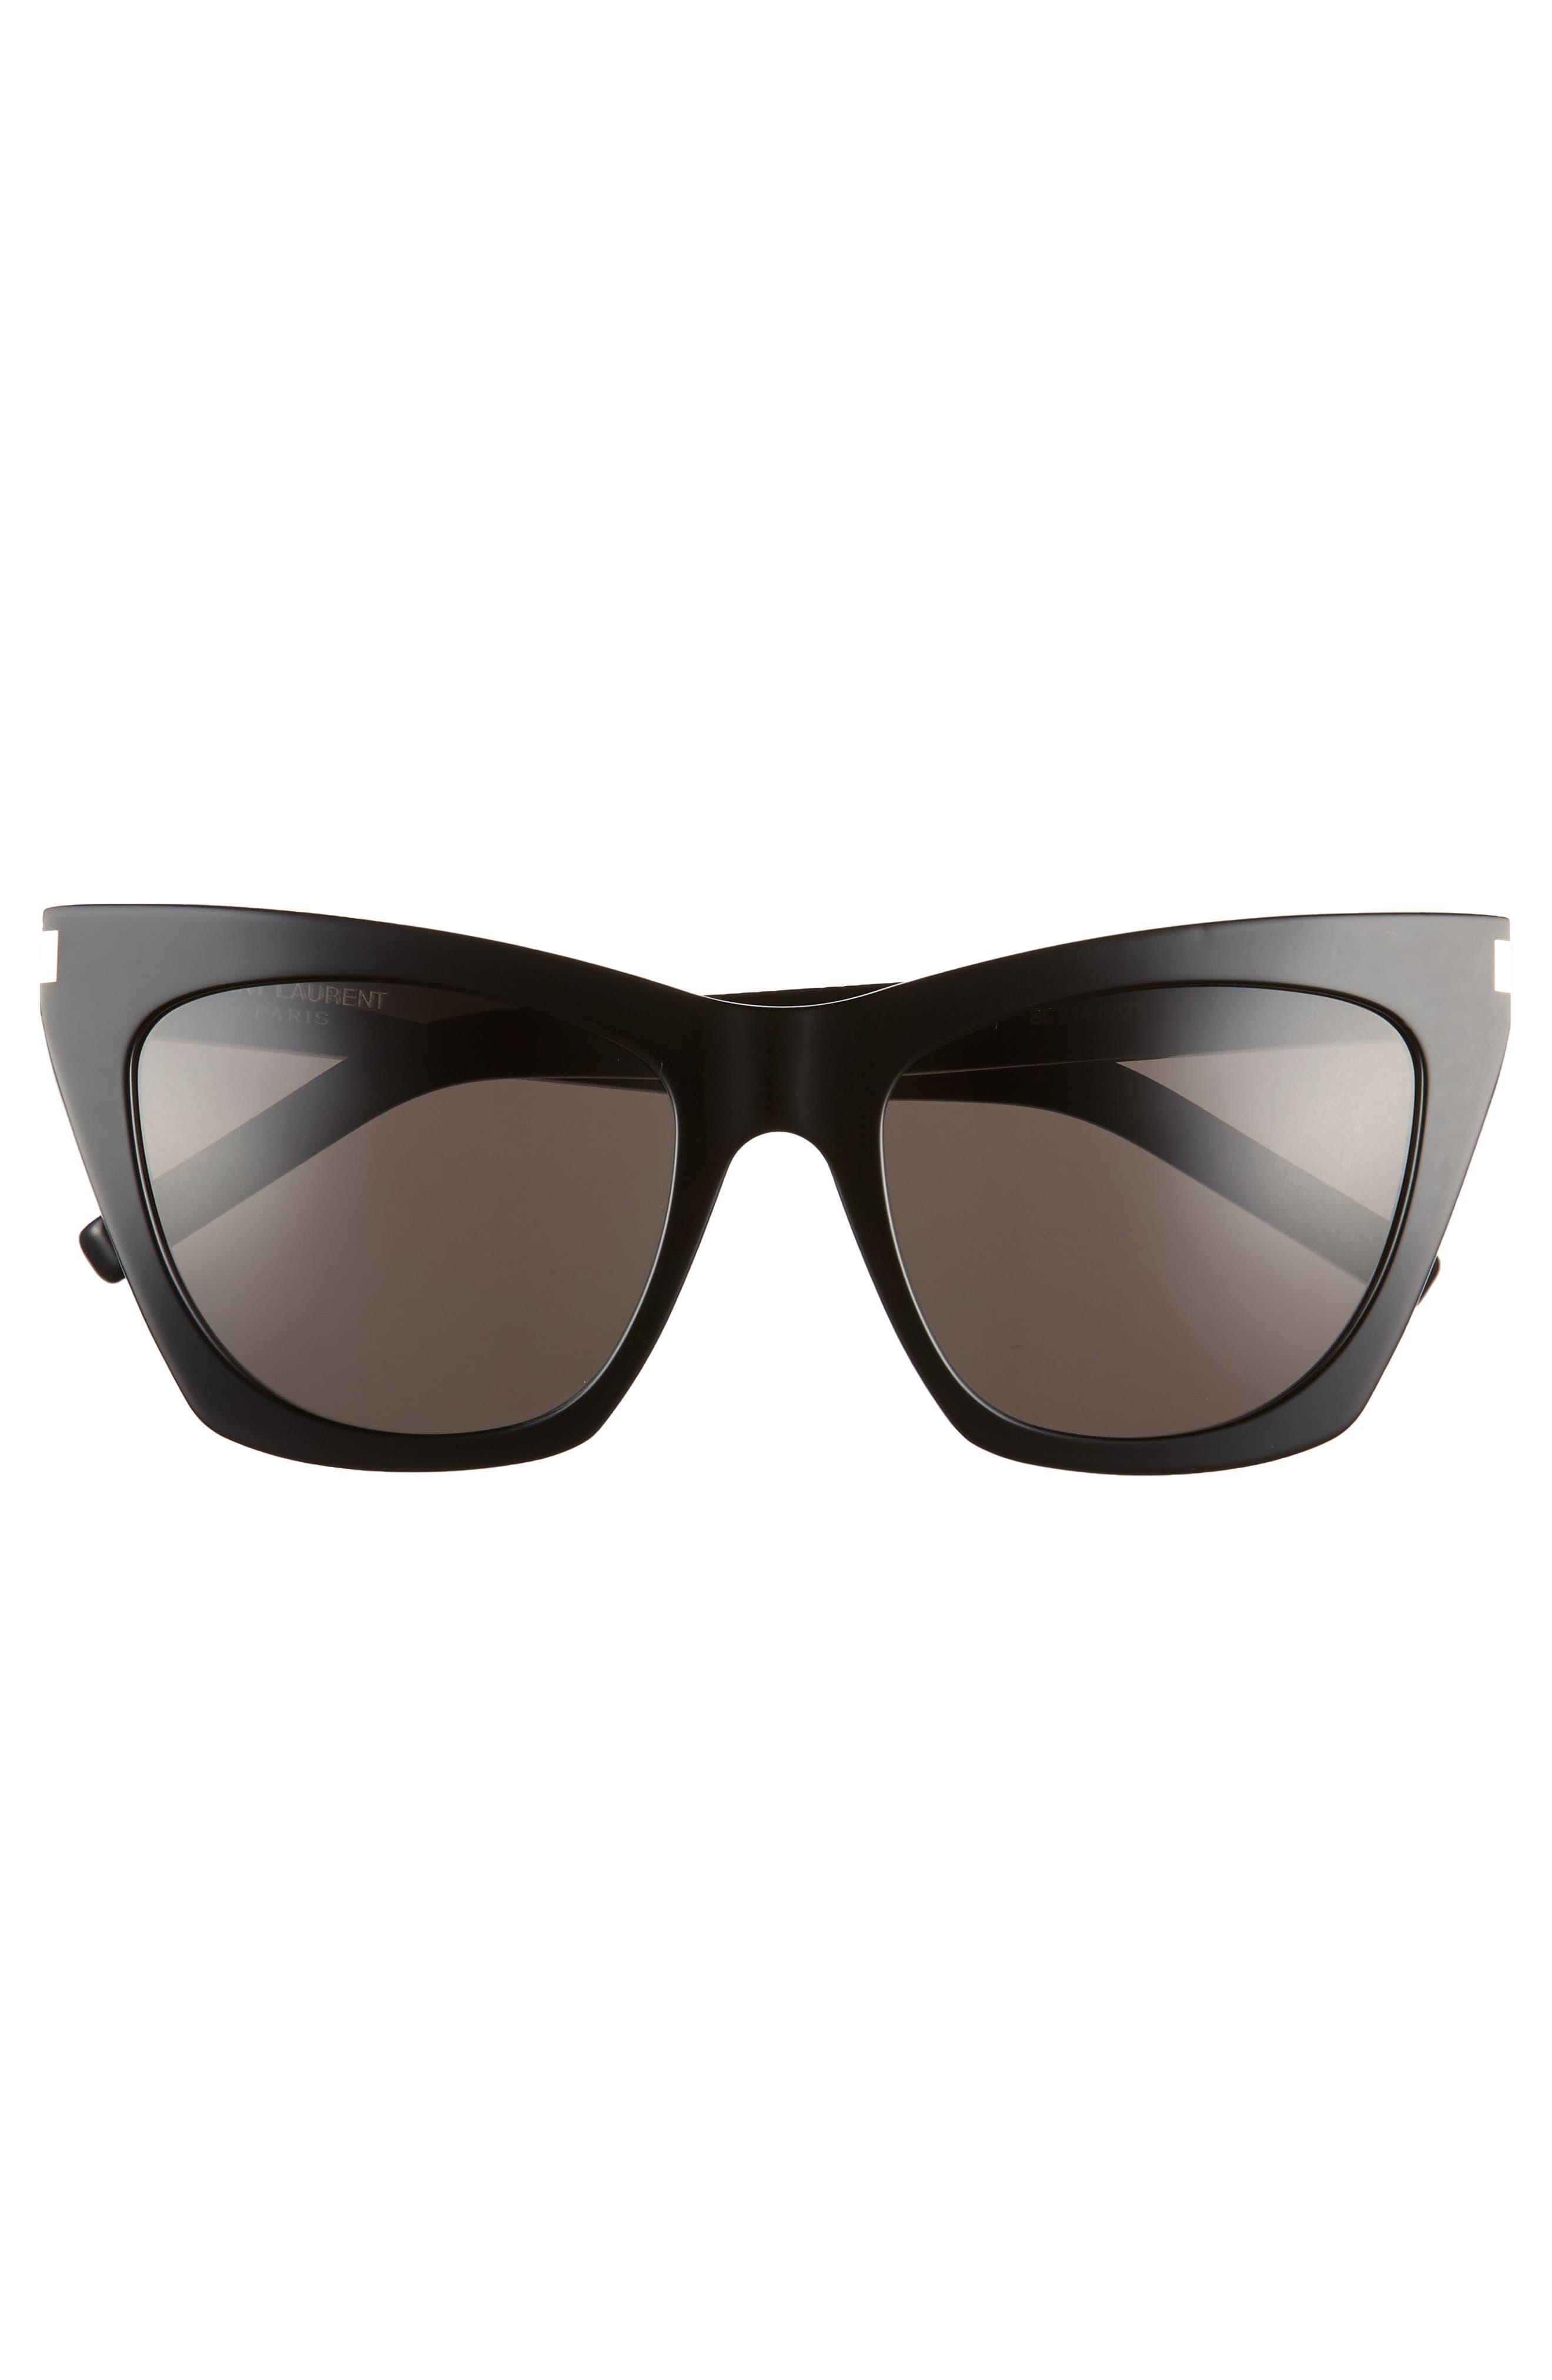 Kate 55mm Cat Eye Sunglasses,                             Alternate thumbnail 3, color,                             BLACK